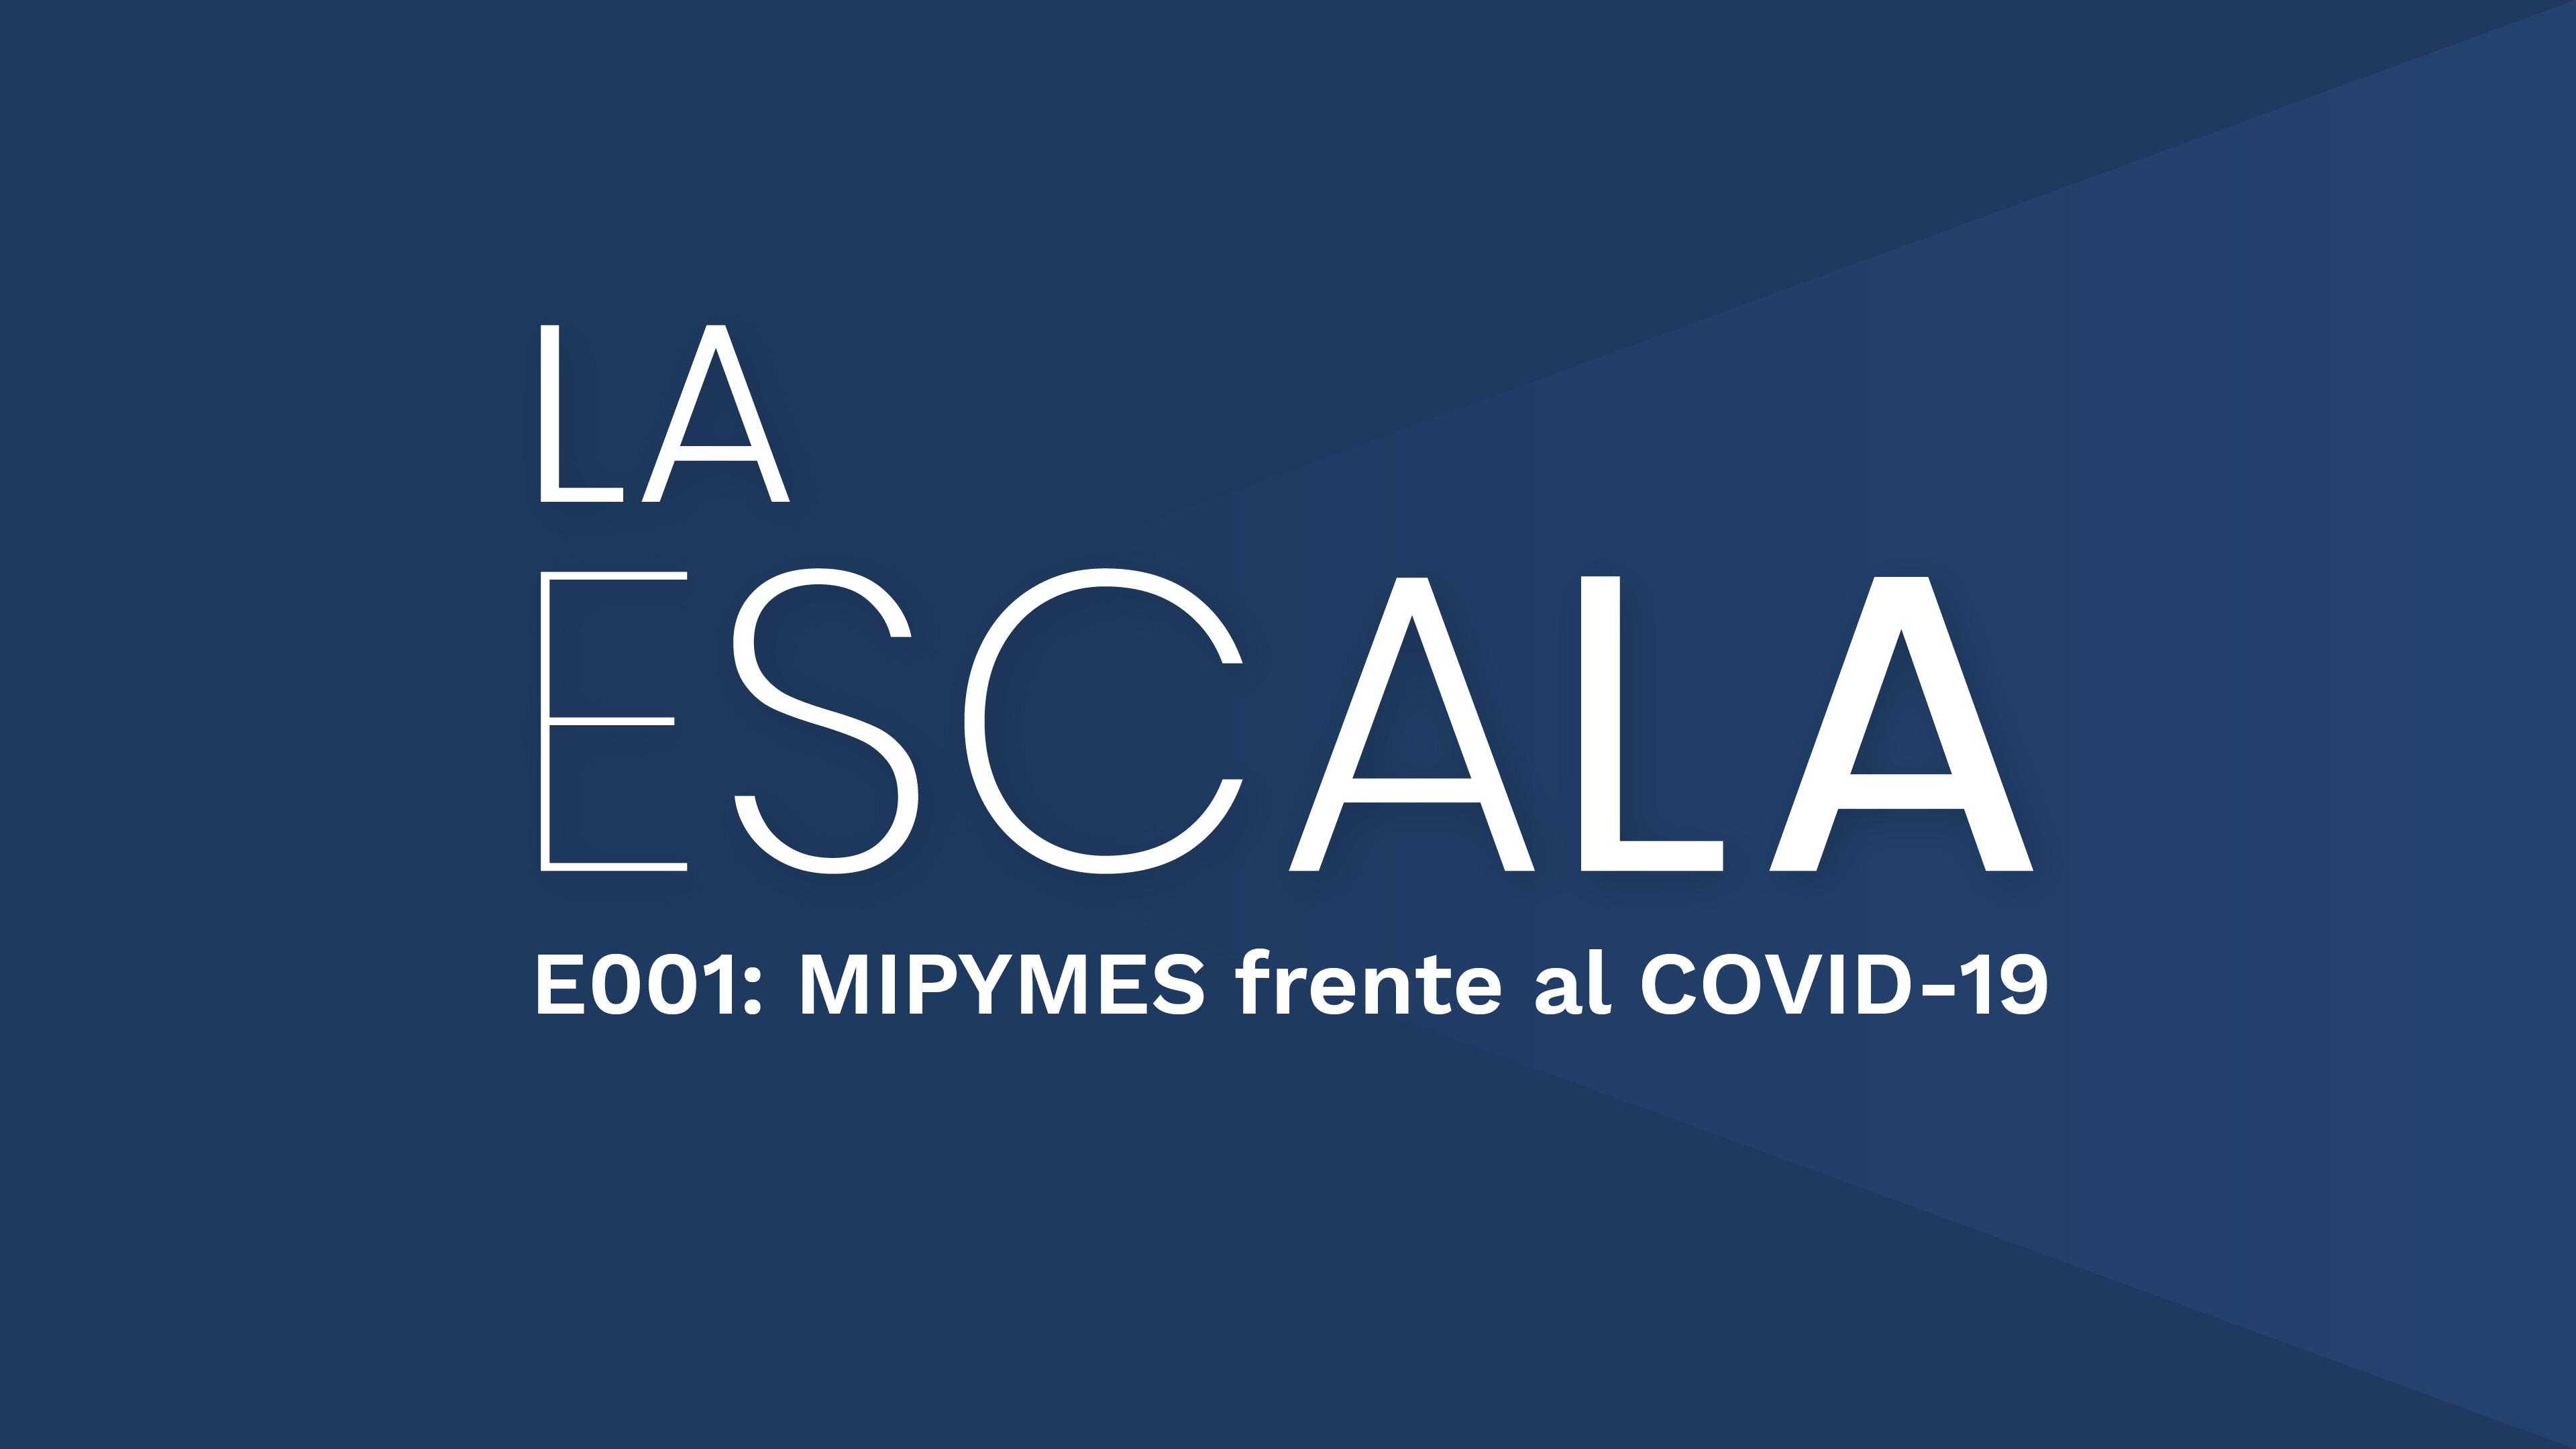 La Escala - Ep. 1: MIPYMES frente al COVID-19